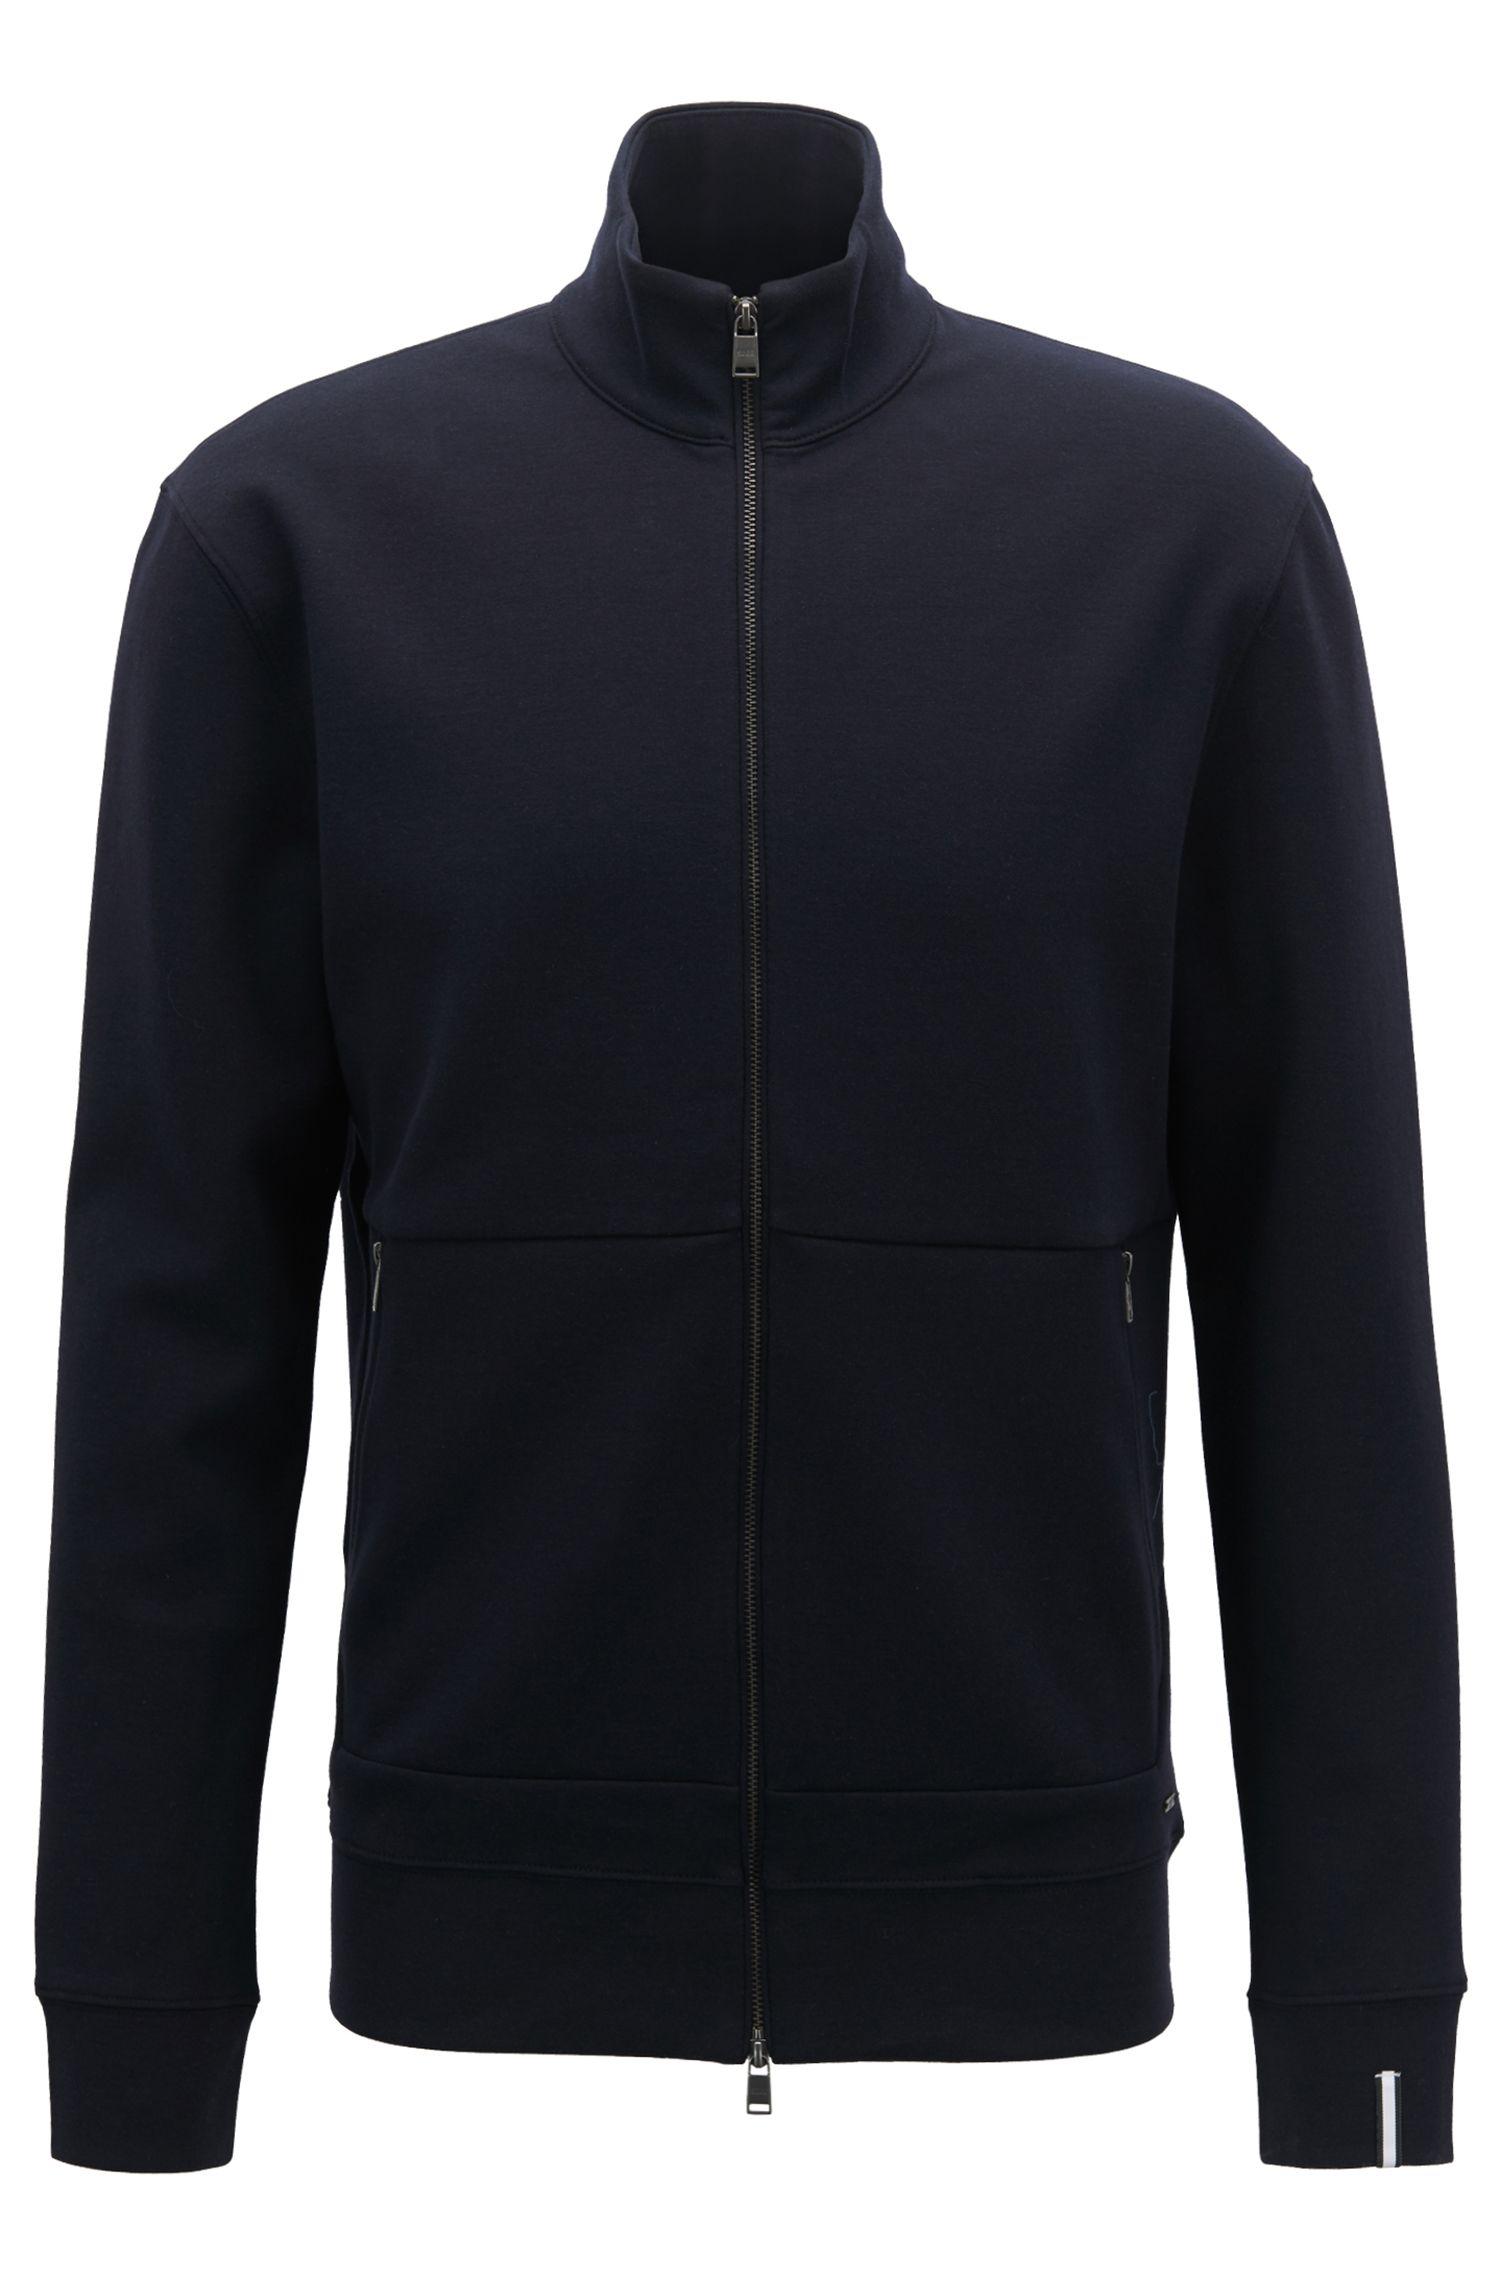 Zip-through sweatshirt in a double-face cotton blend